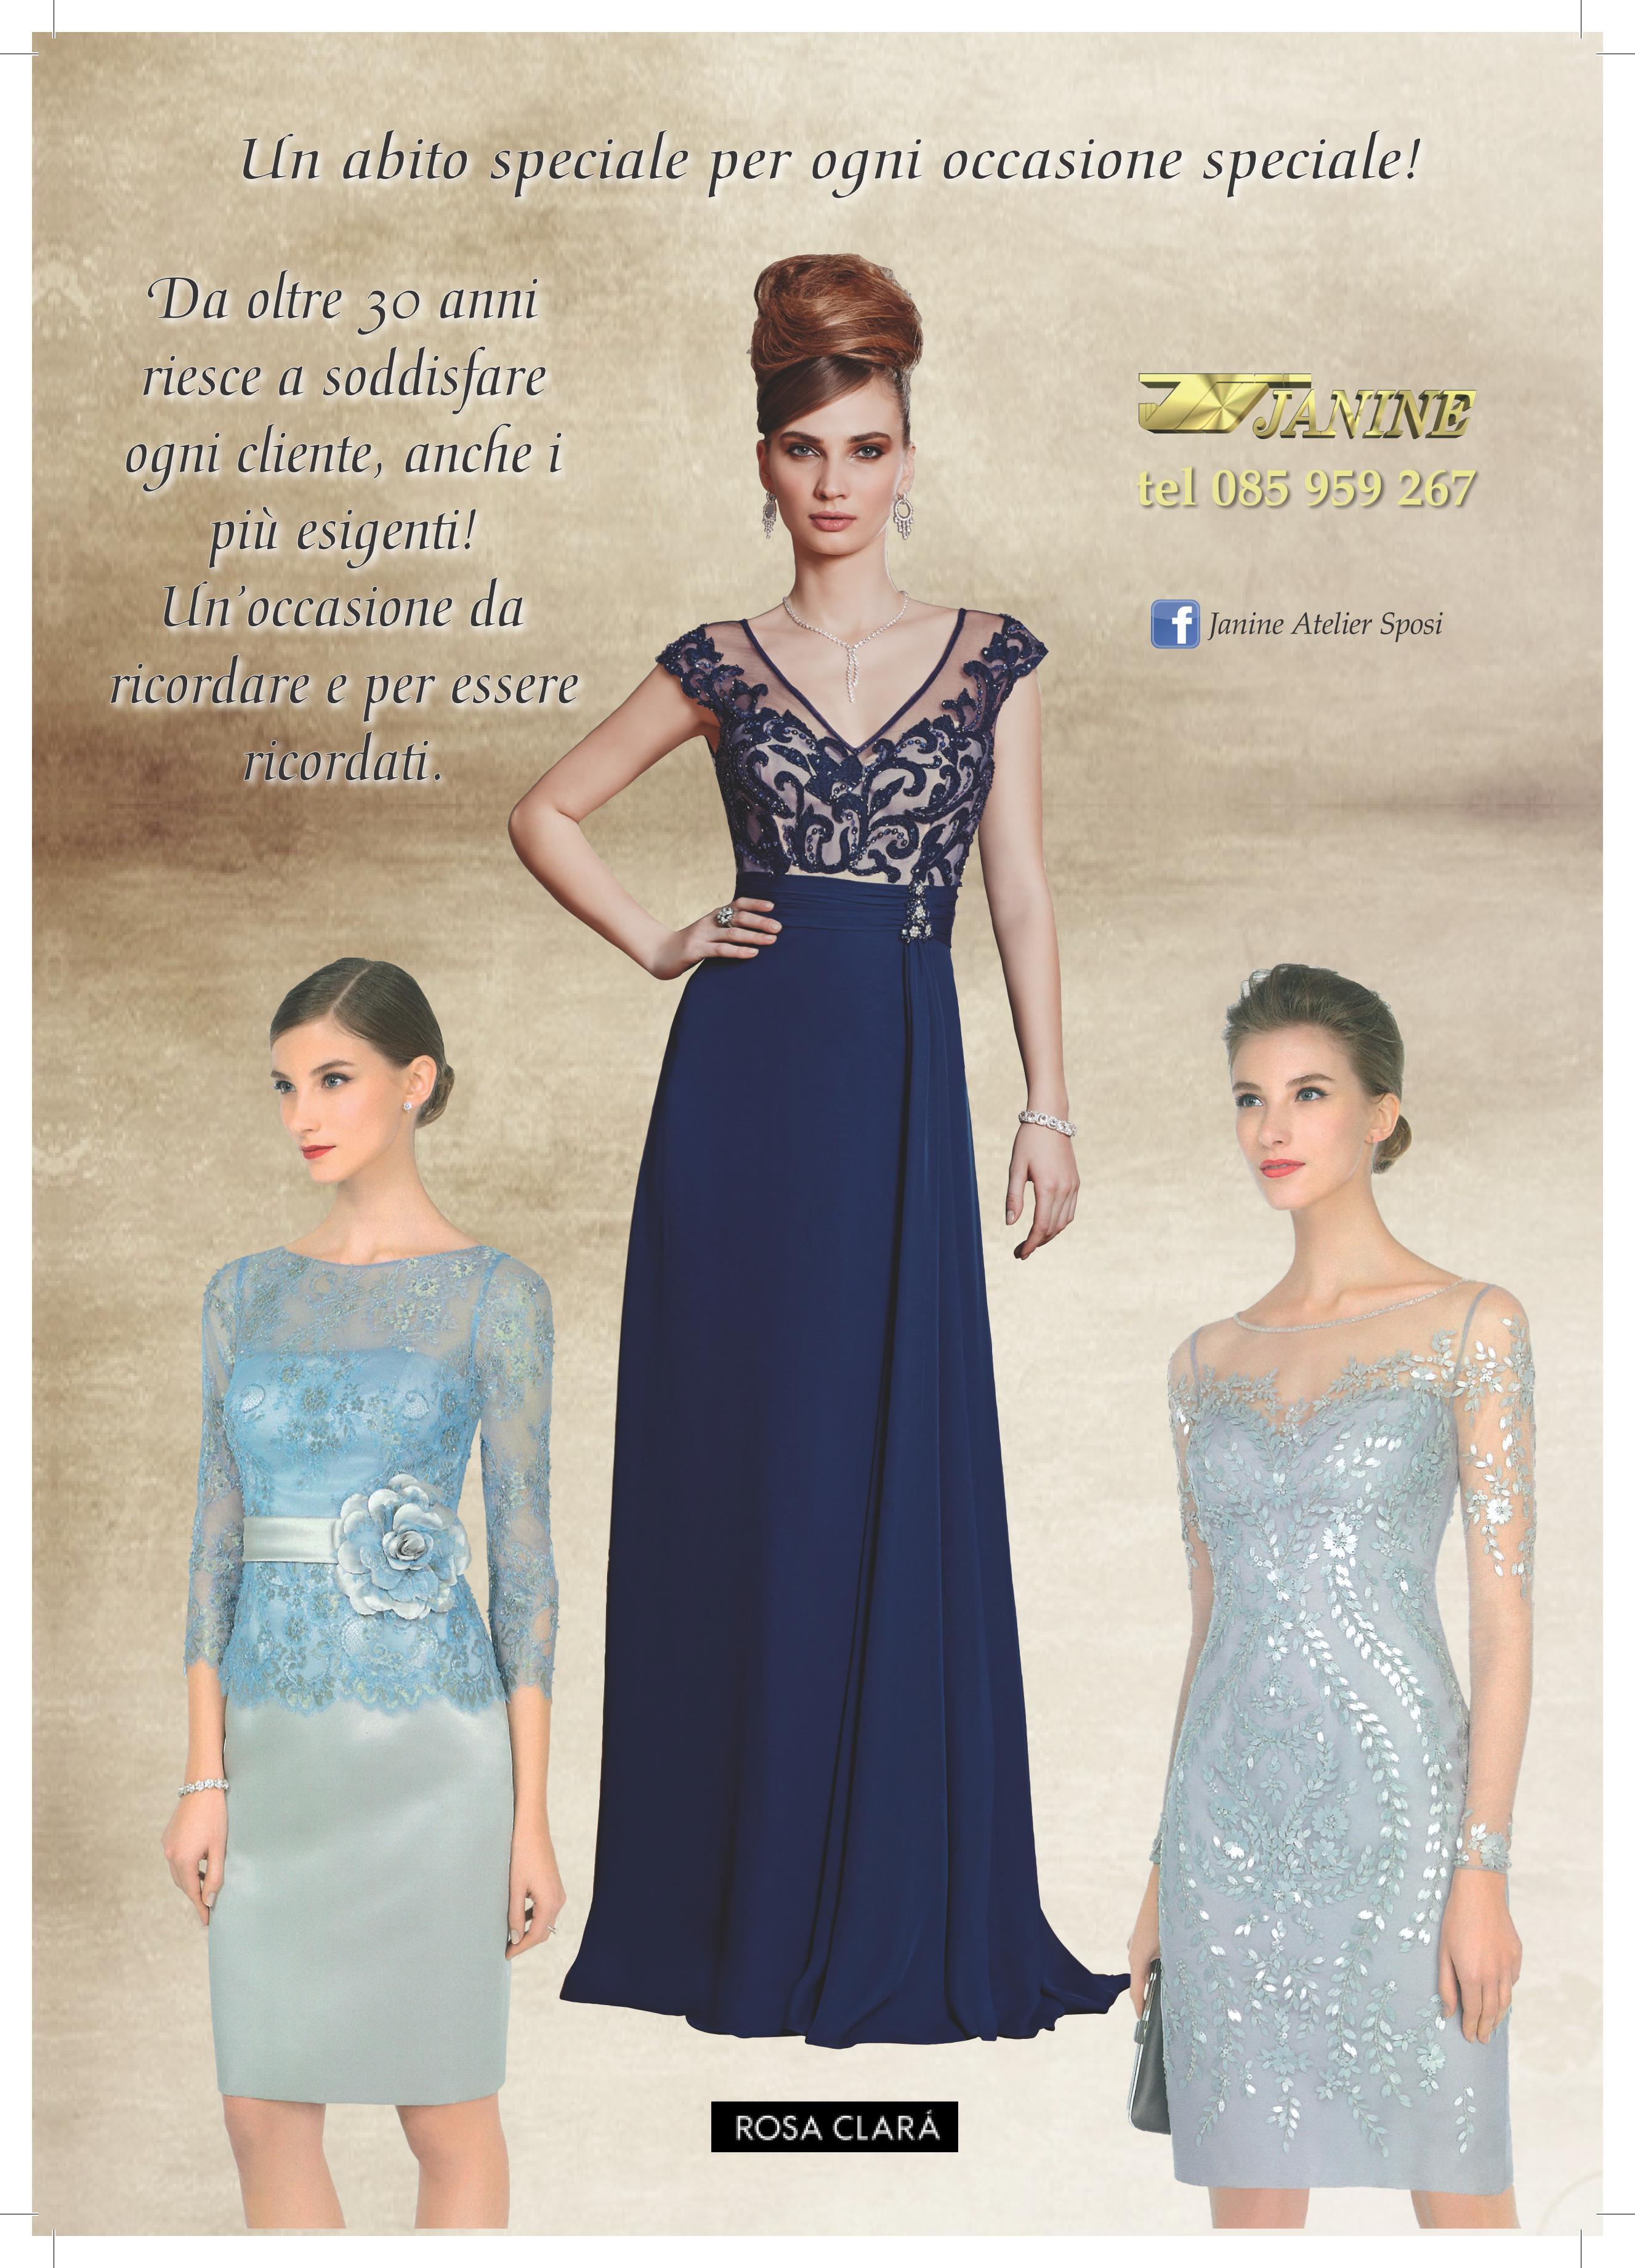 Abiti Da Cerimonia Janine.Couture Club By Rosa Clara Atelier Janine